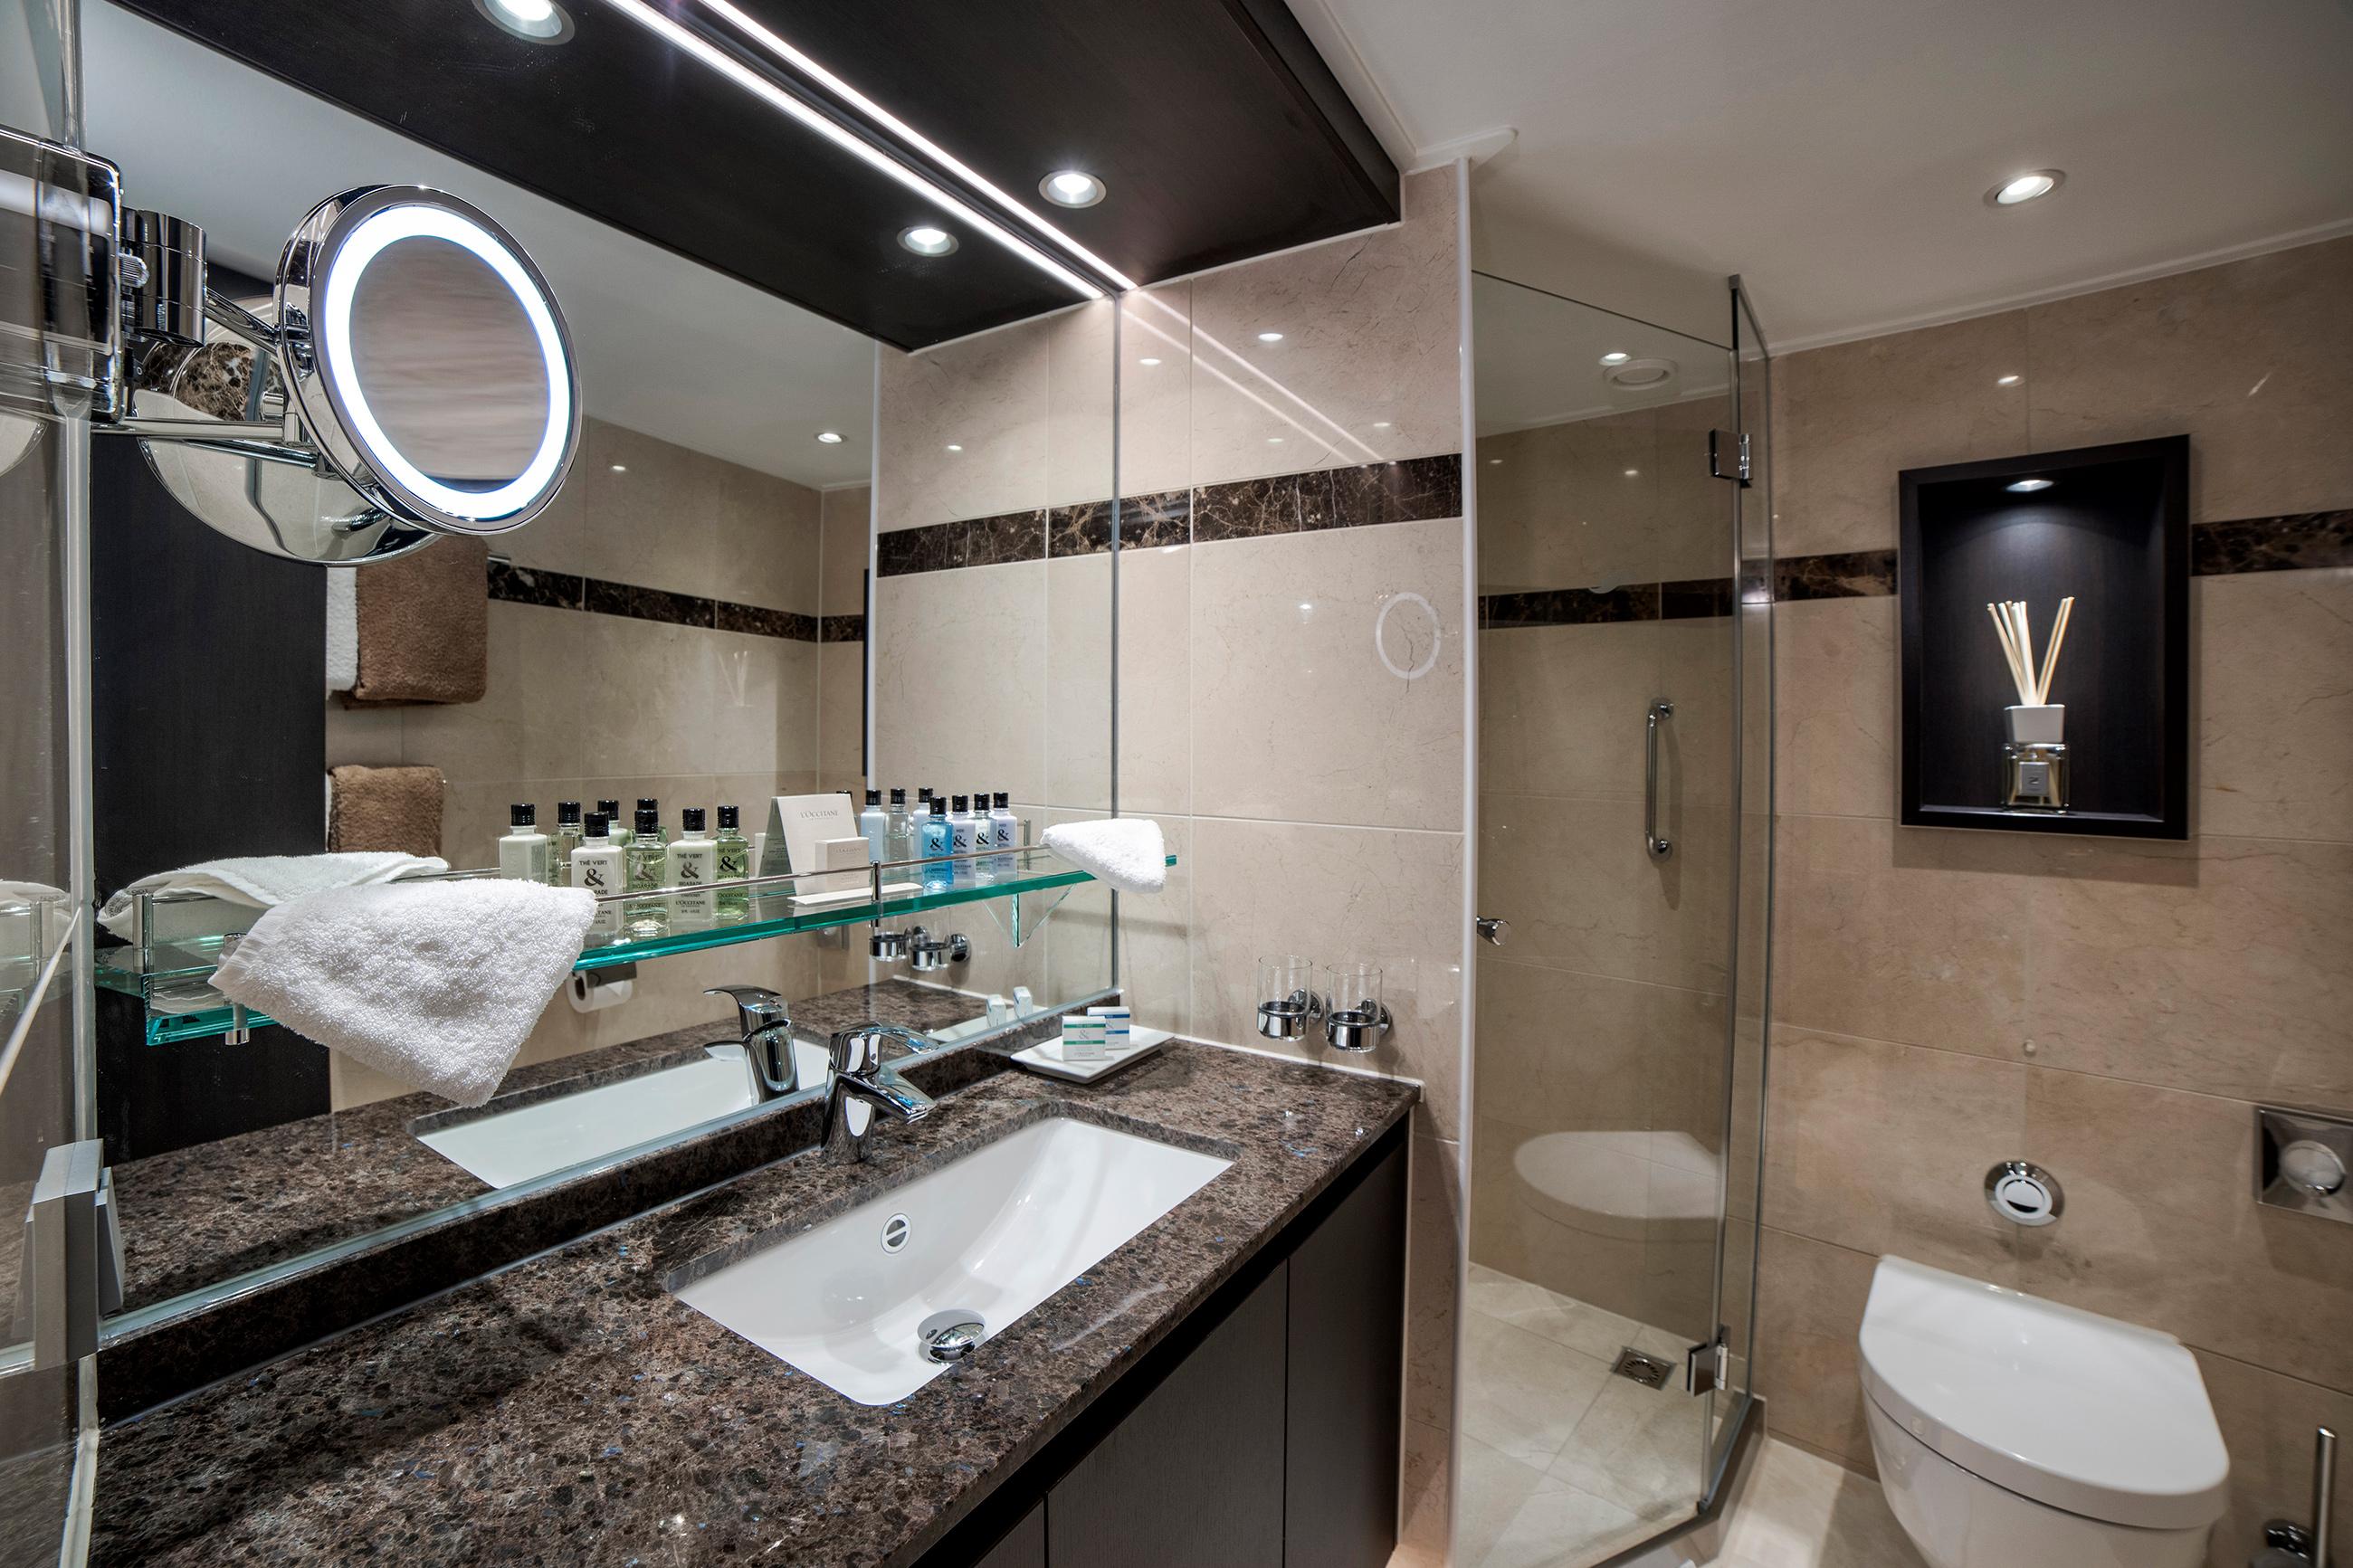 envision-panorama-bathroom.jpg